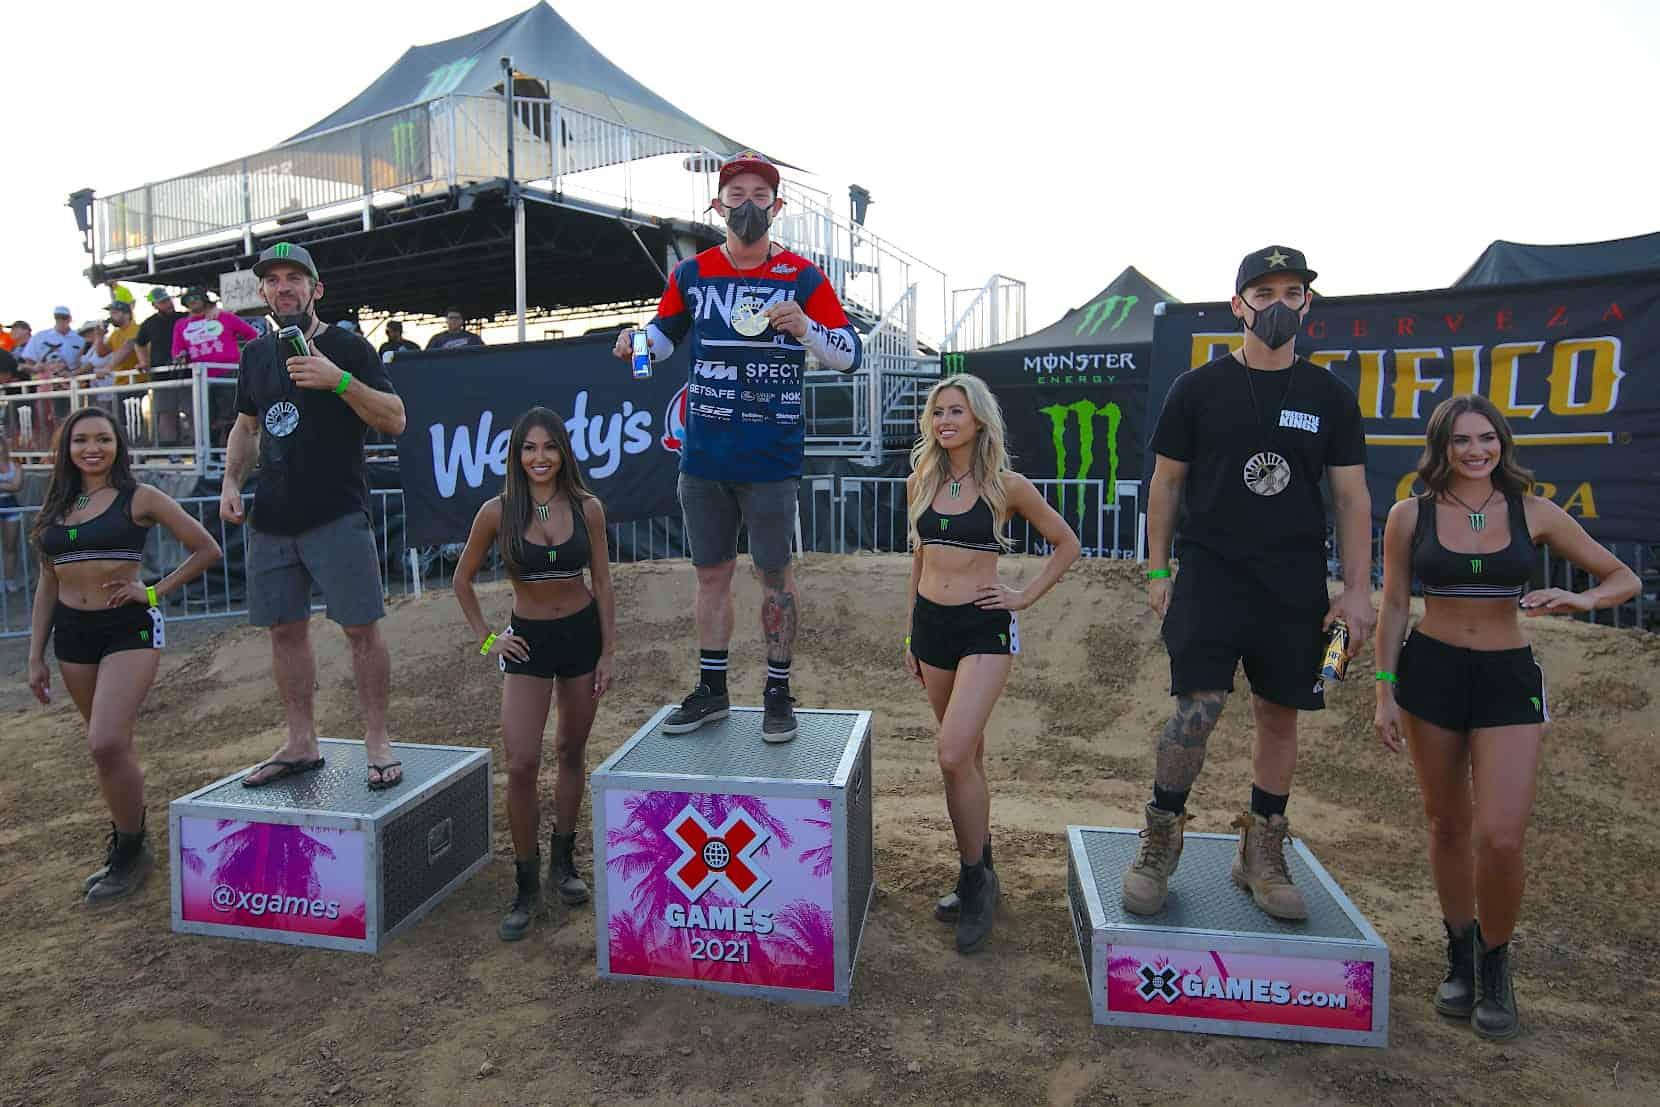 FMX-Weltmeister Luc Ackermann gewinnt Gold bei den X-Games